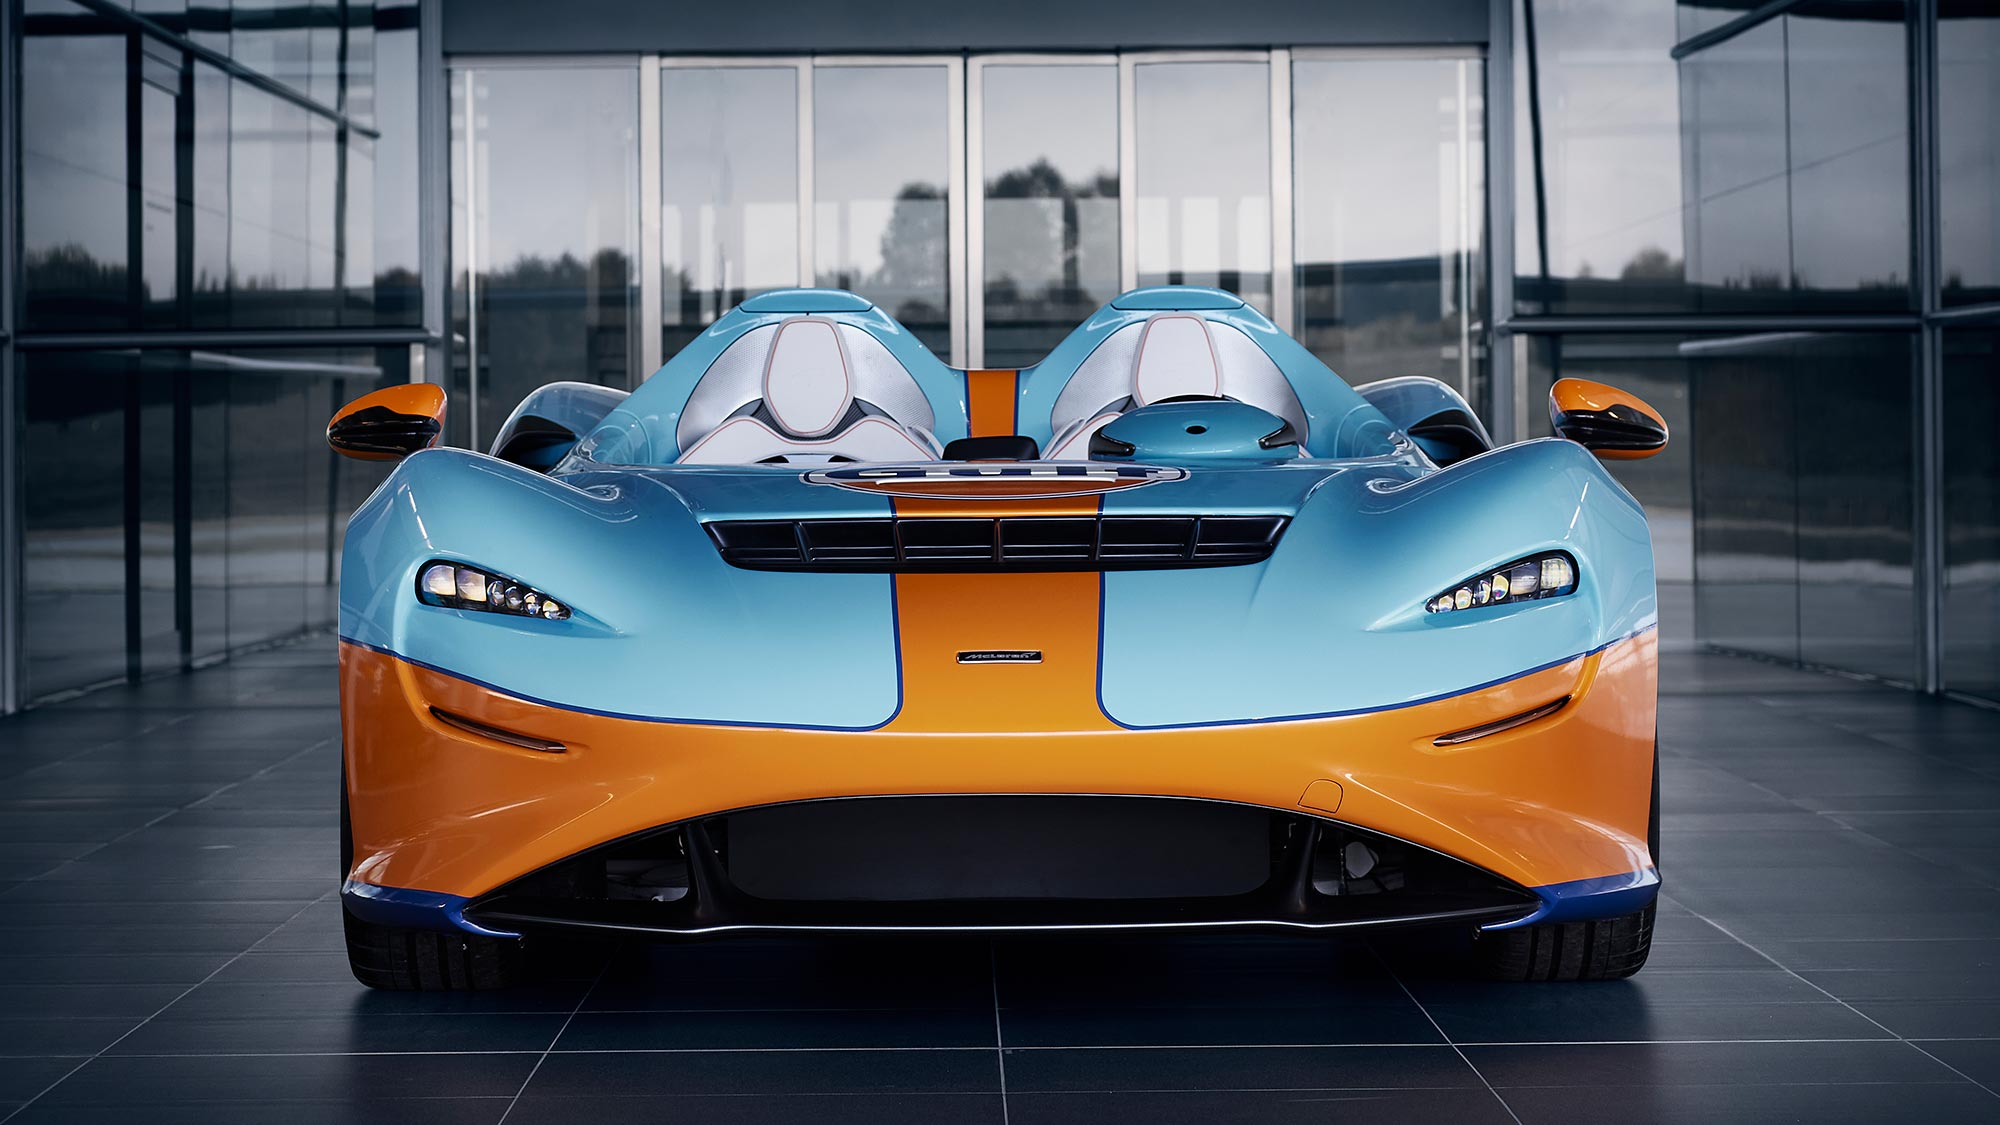 McLaren Elva Supercar in Gulf Oil Colors